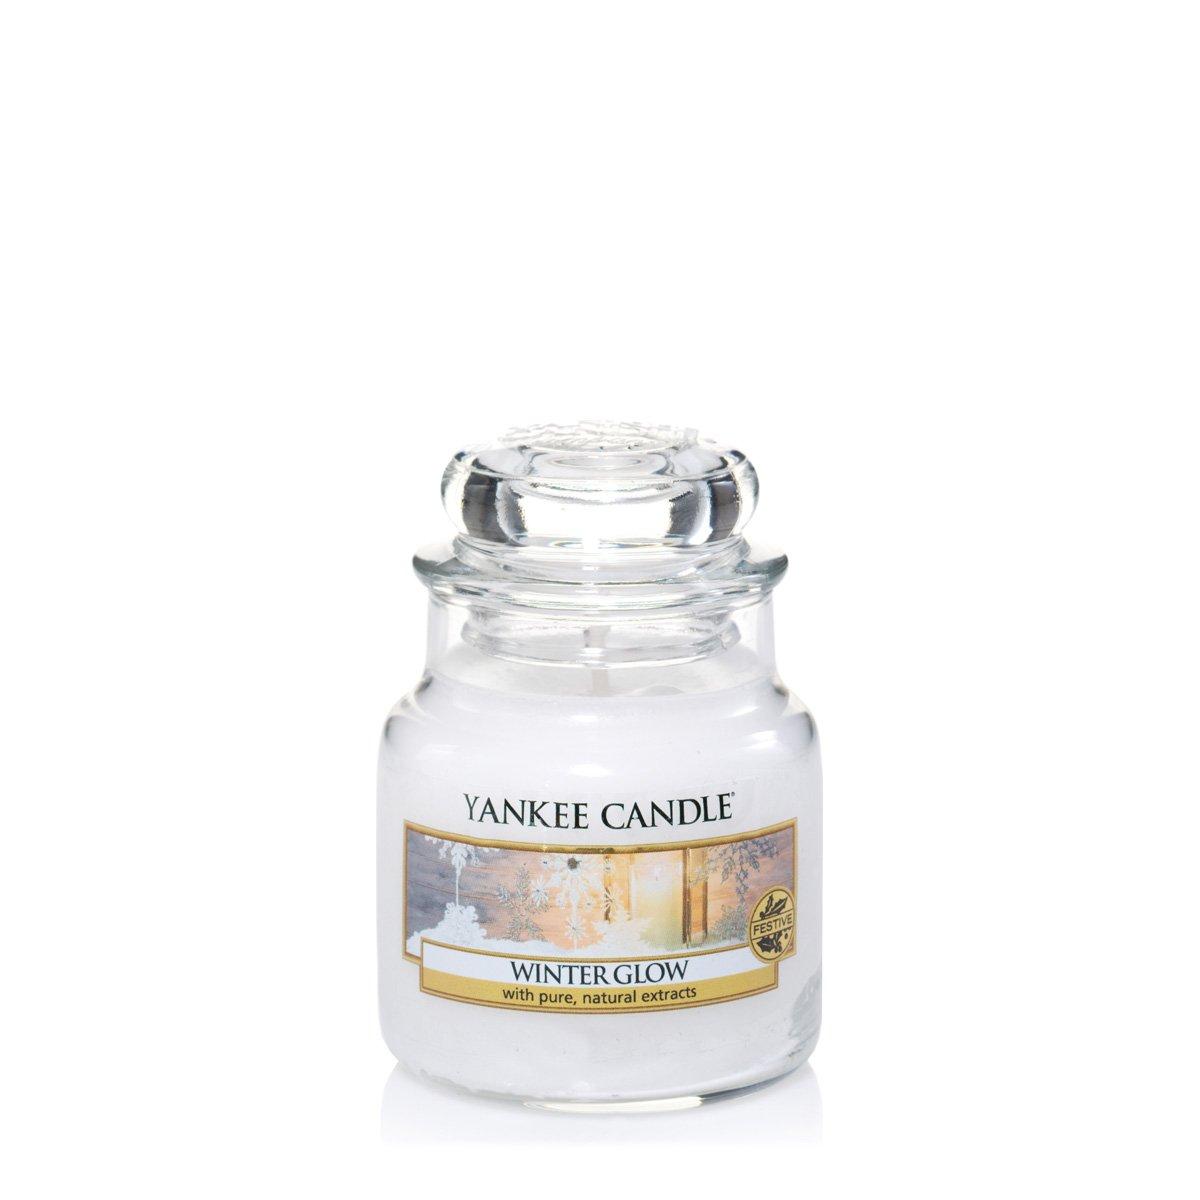 YANKEE CANDLE Bougie Petite Jarre, «Lueur hivernale» 1342539E